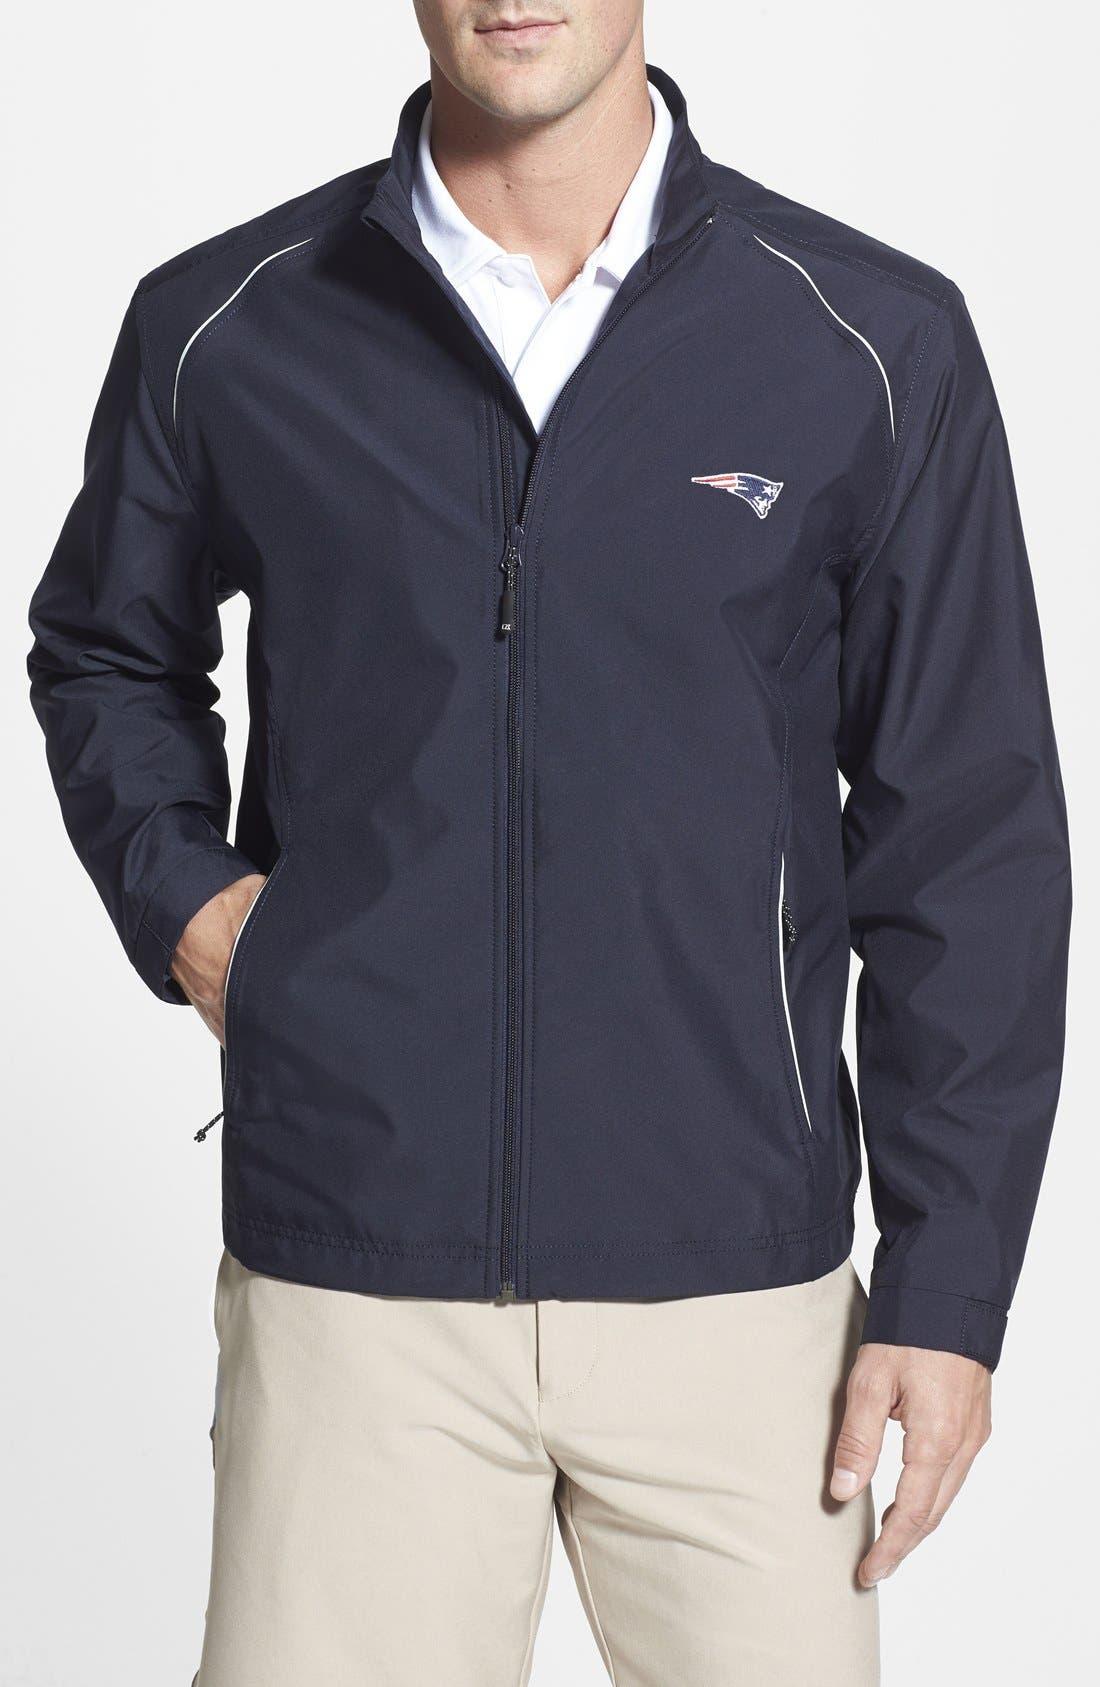 Main Image - Cutter & Buck New England Patriots - Beacon WeatherTec Wind & Water Resistant Jacket